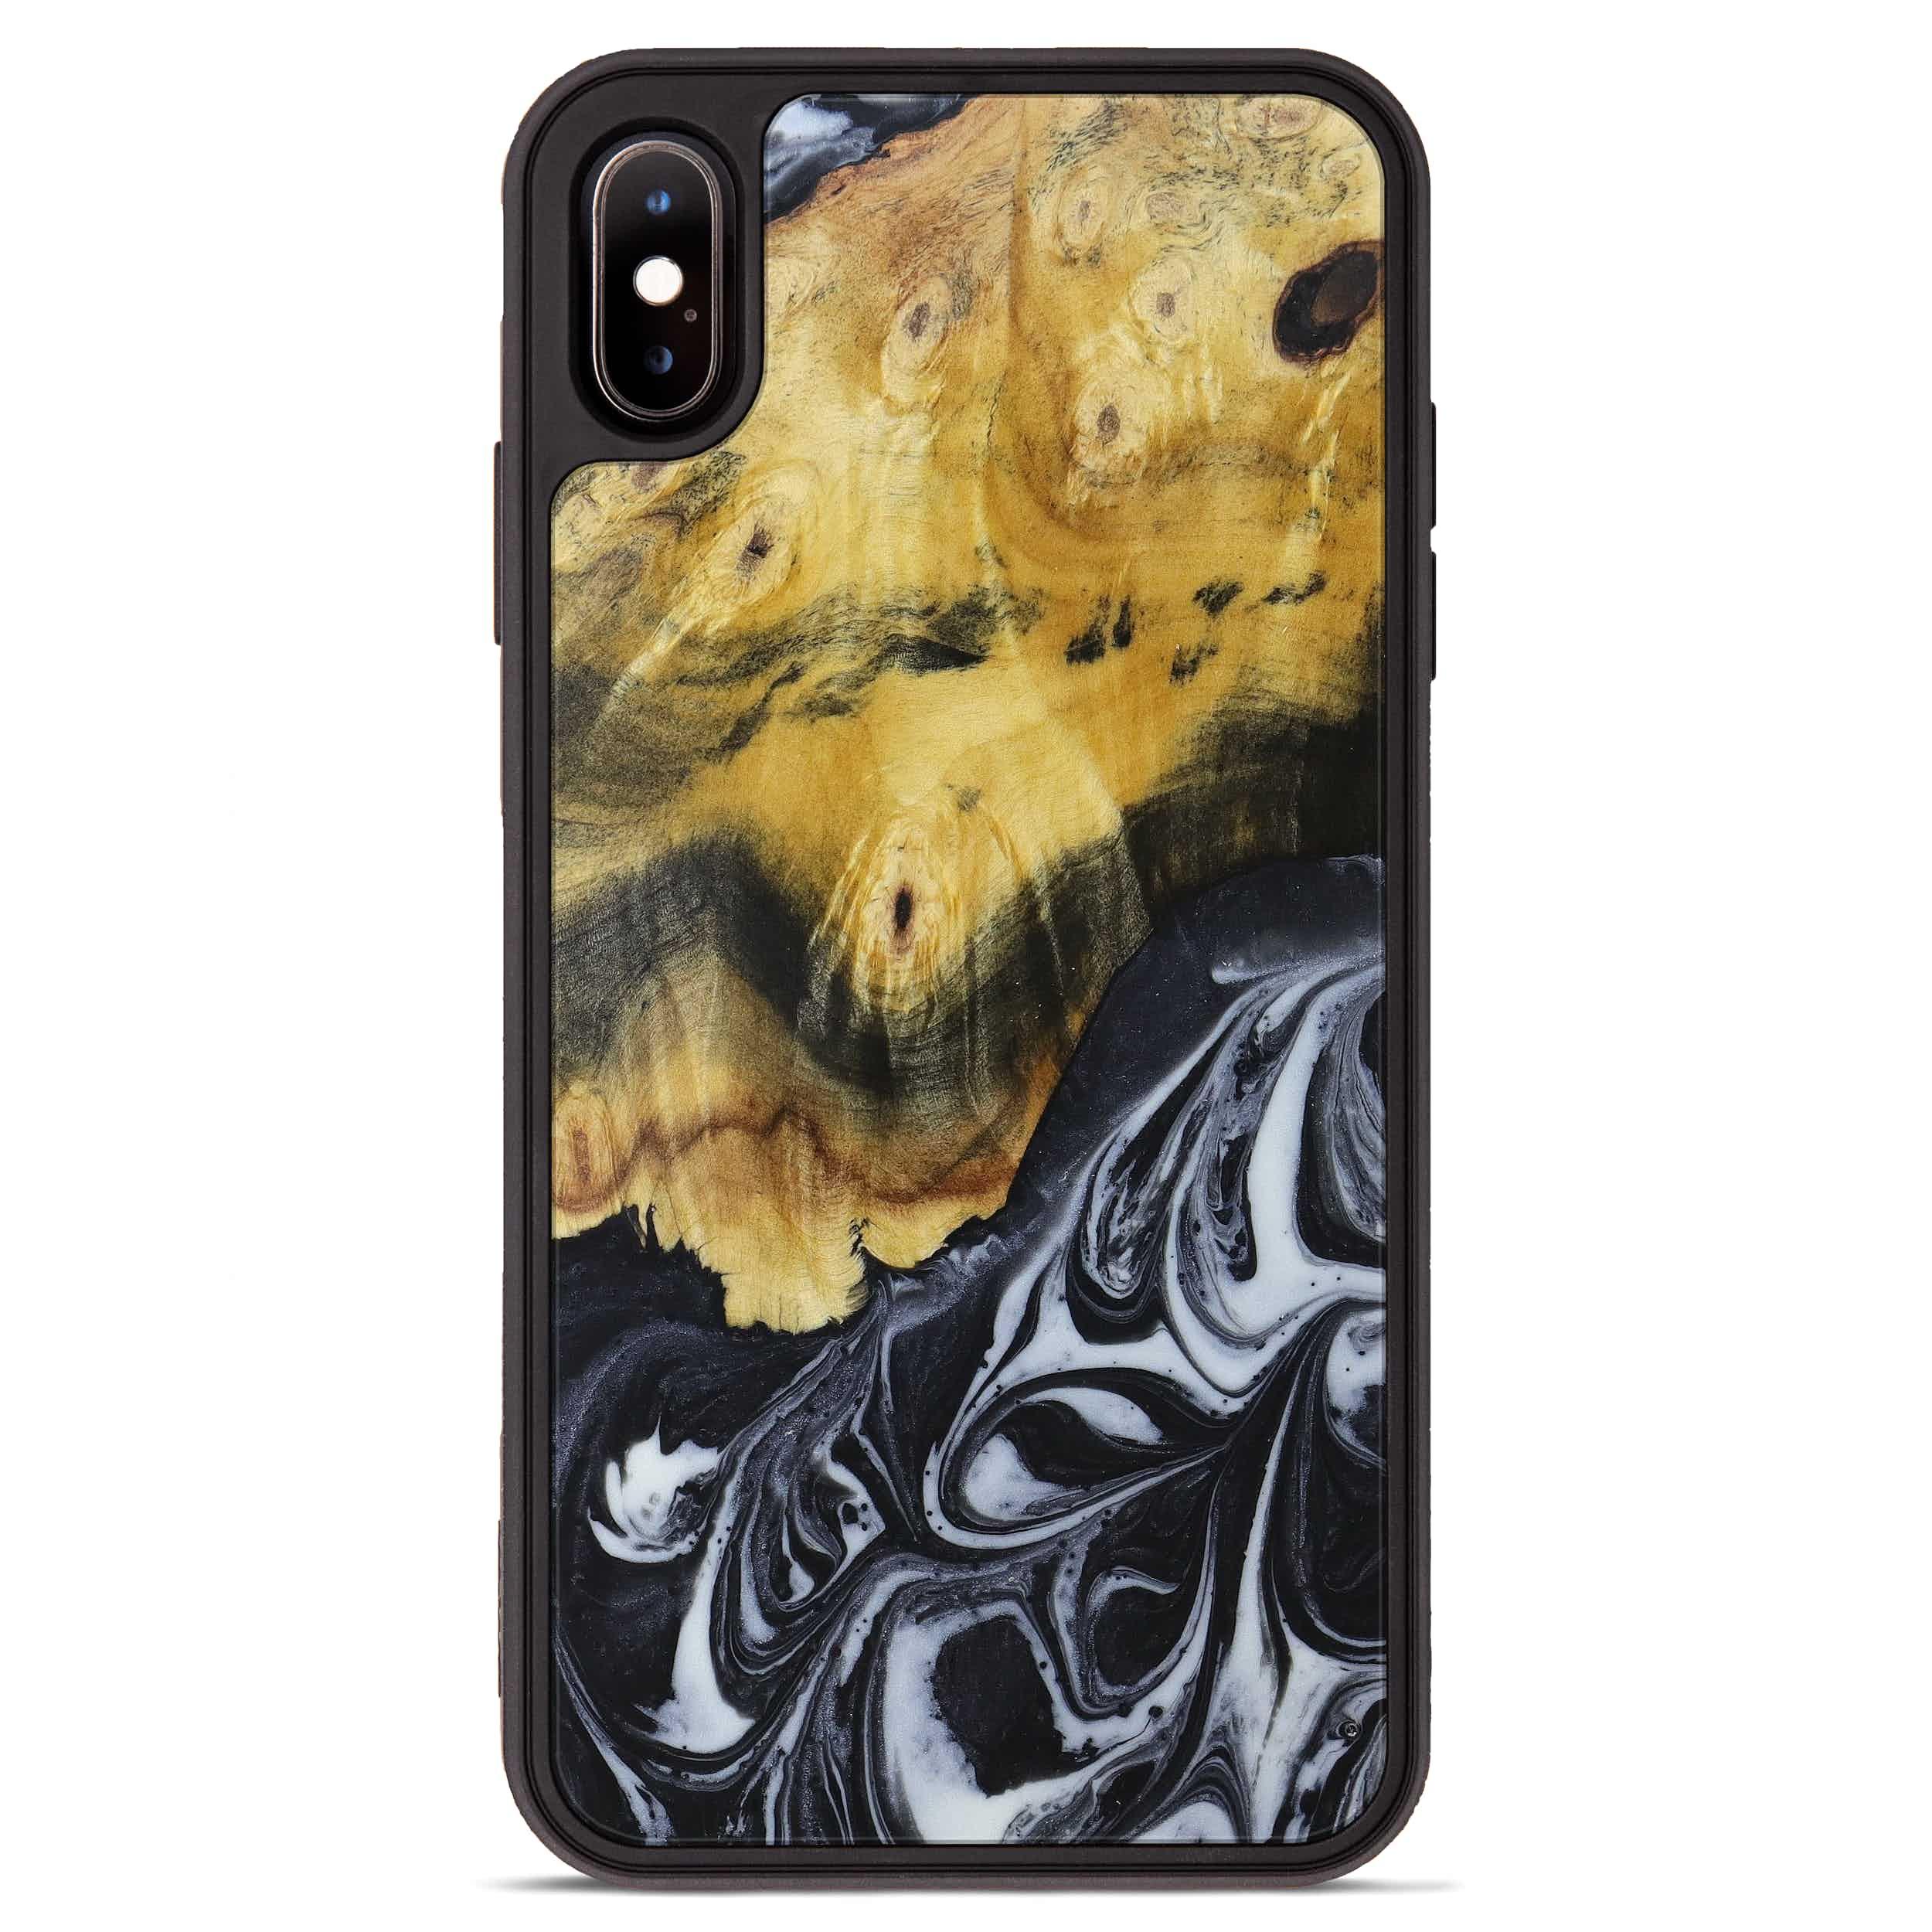 iPhone Xs Max Wood+Resin Phone Case - Mauro (Black & White, 397356)